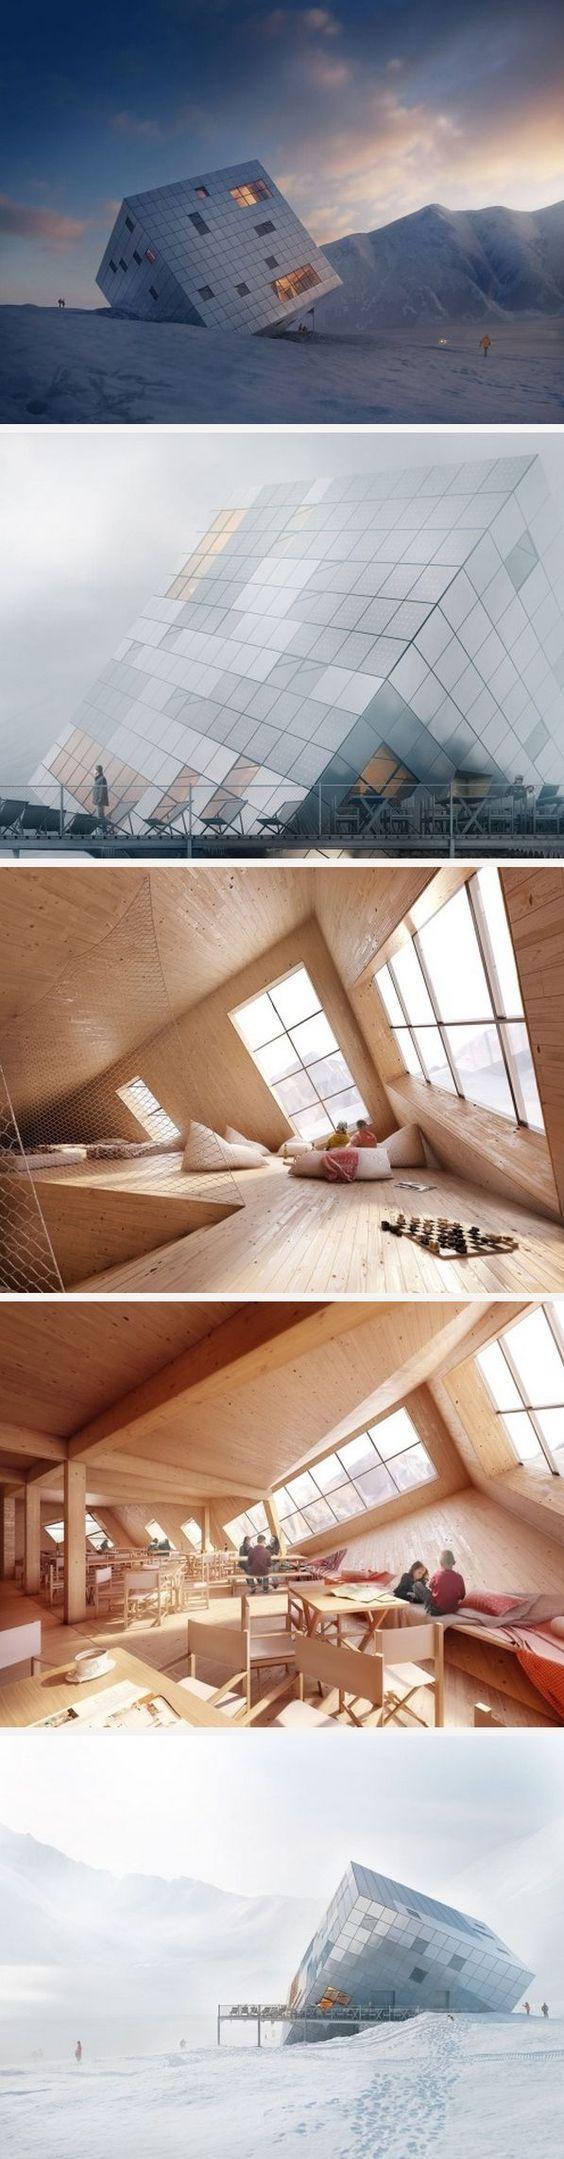 Modern Architecture & Beautiful House Designs | #1277: